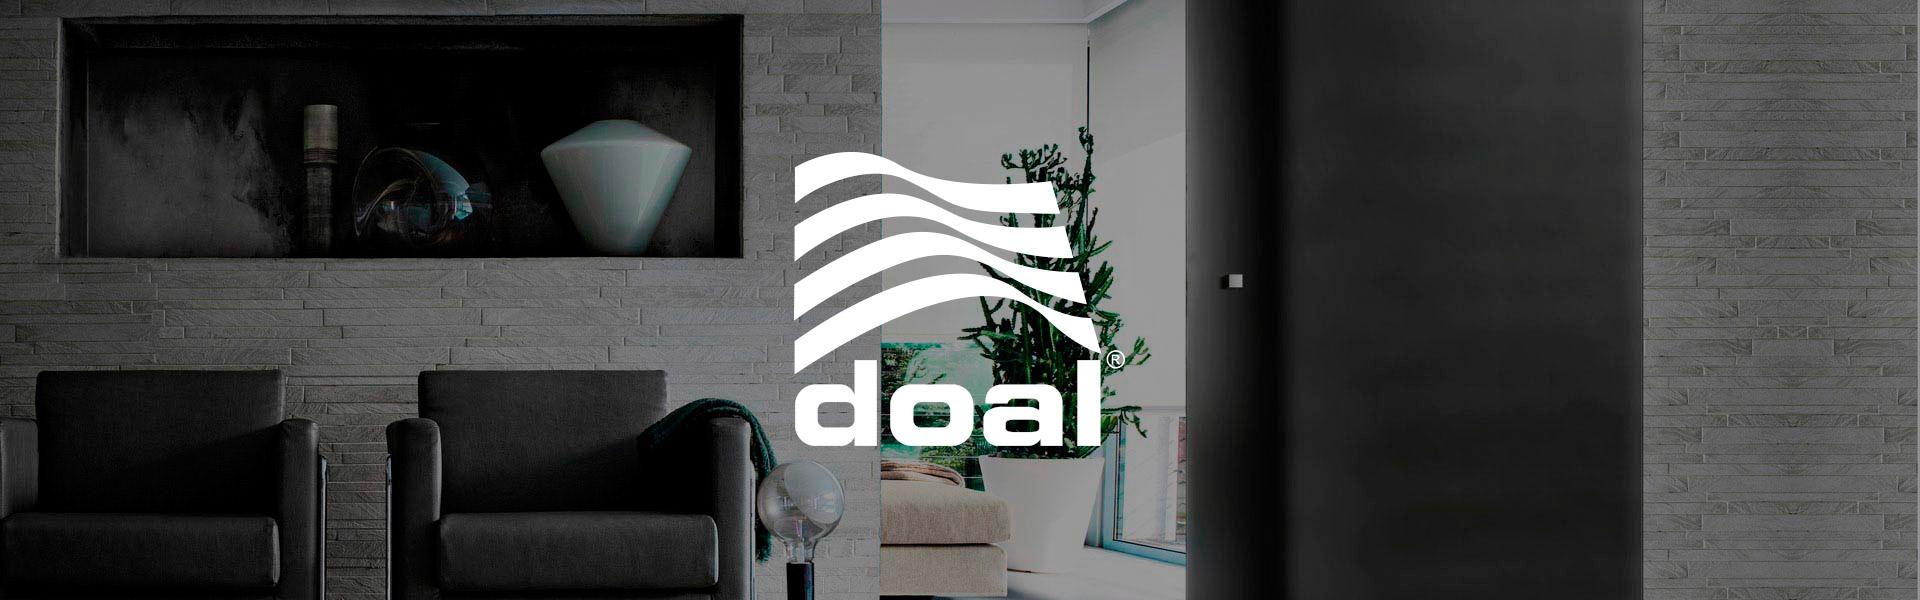 doal_01